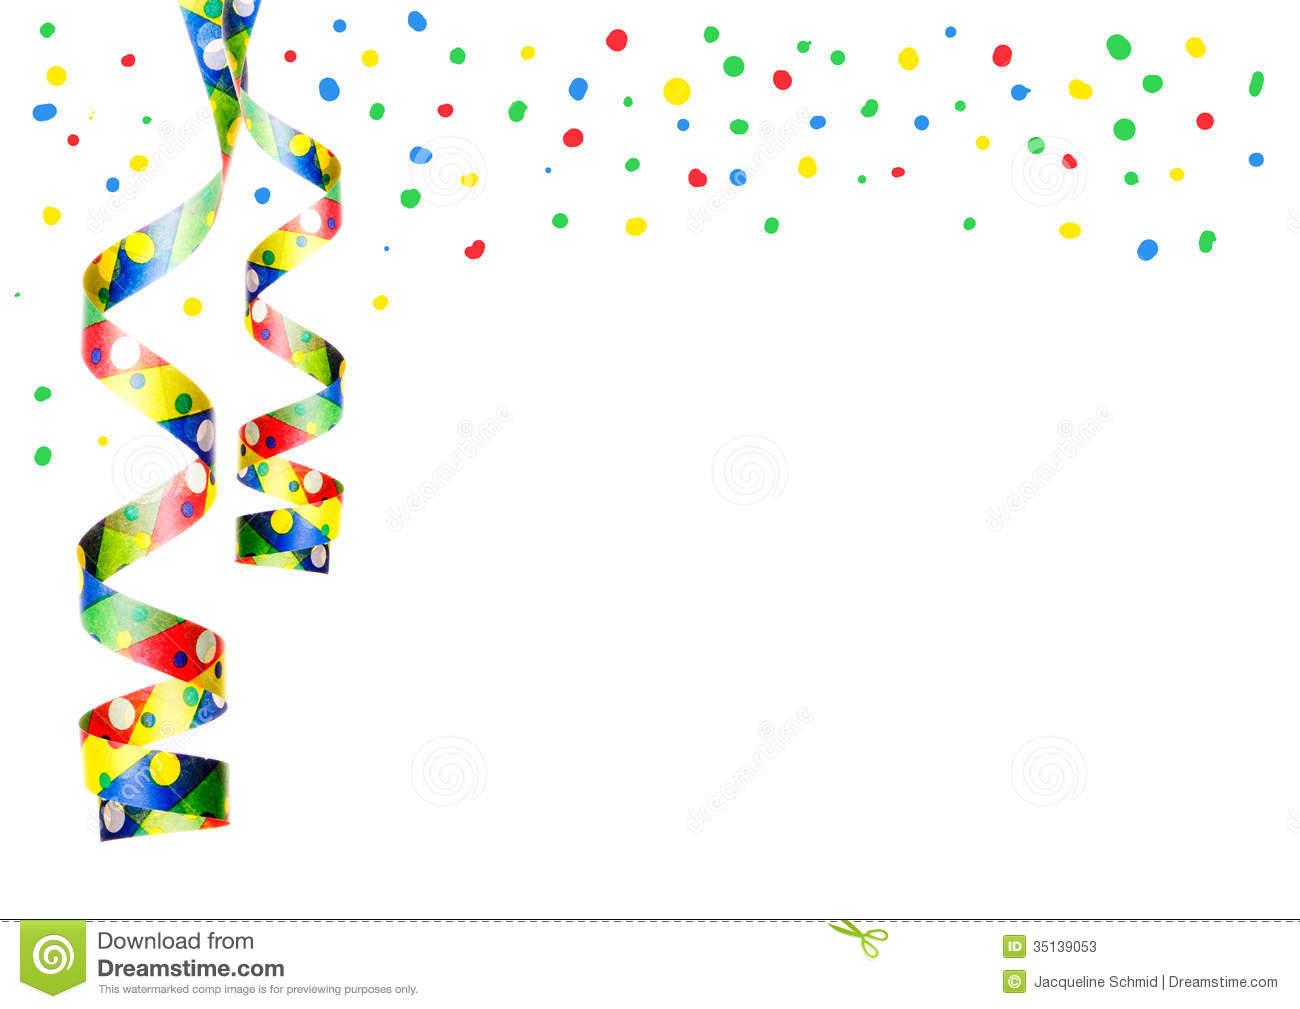 Confetti clipart party decoration   Pencil and in color 1300x1009